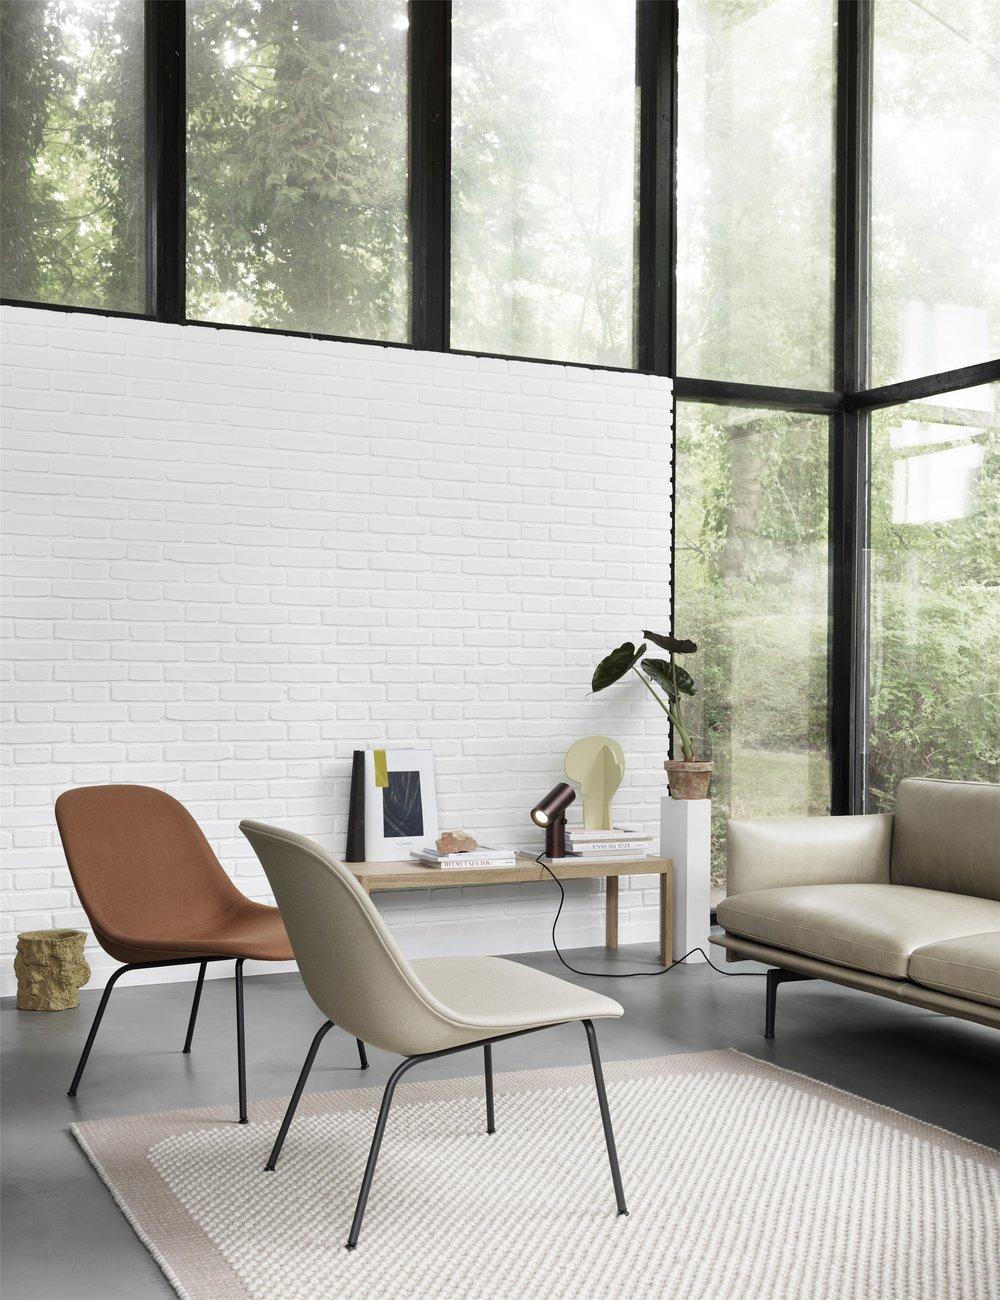 Fiber lounge chair Muuto, living room, modern furniture, scandinavian design, interiors .jpg